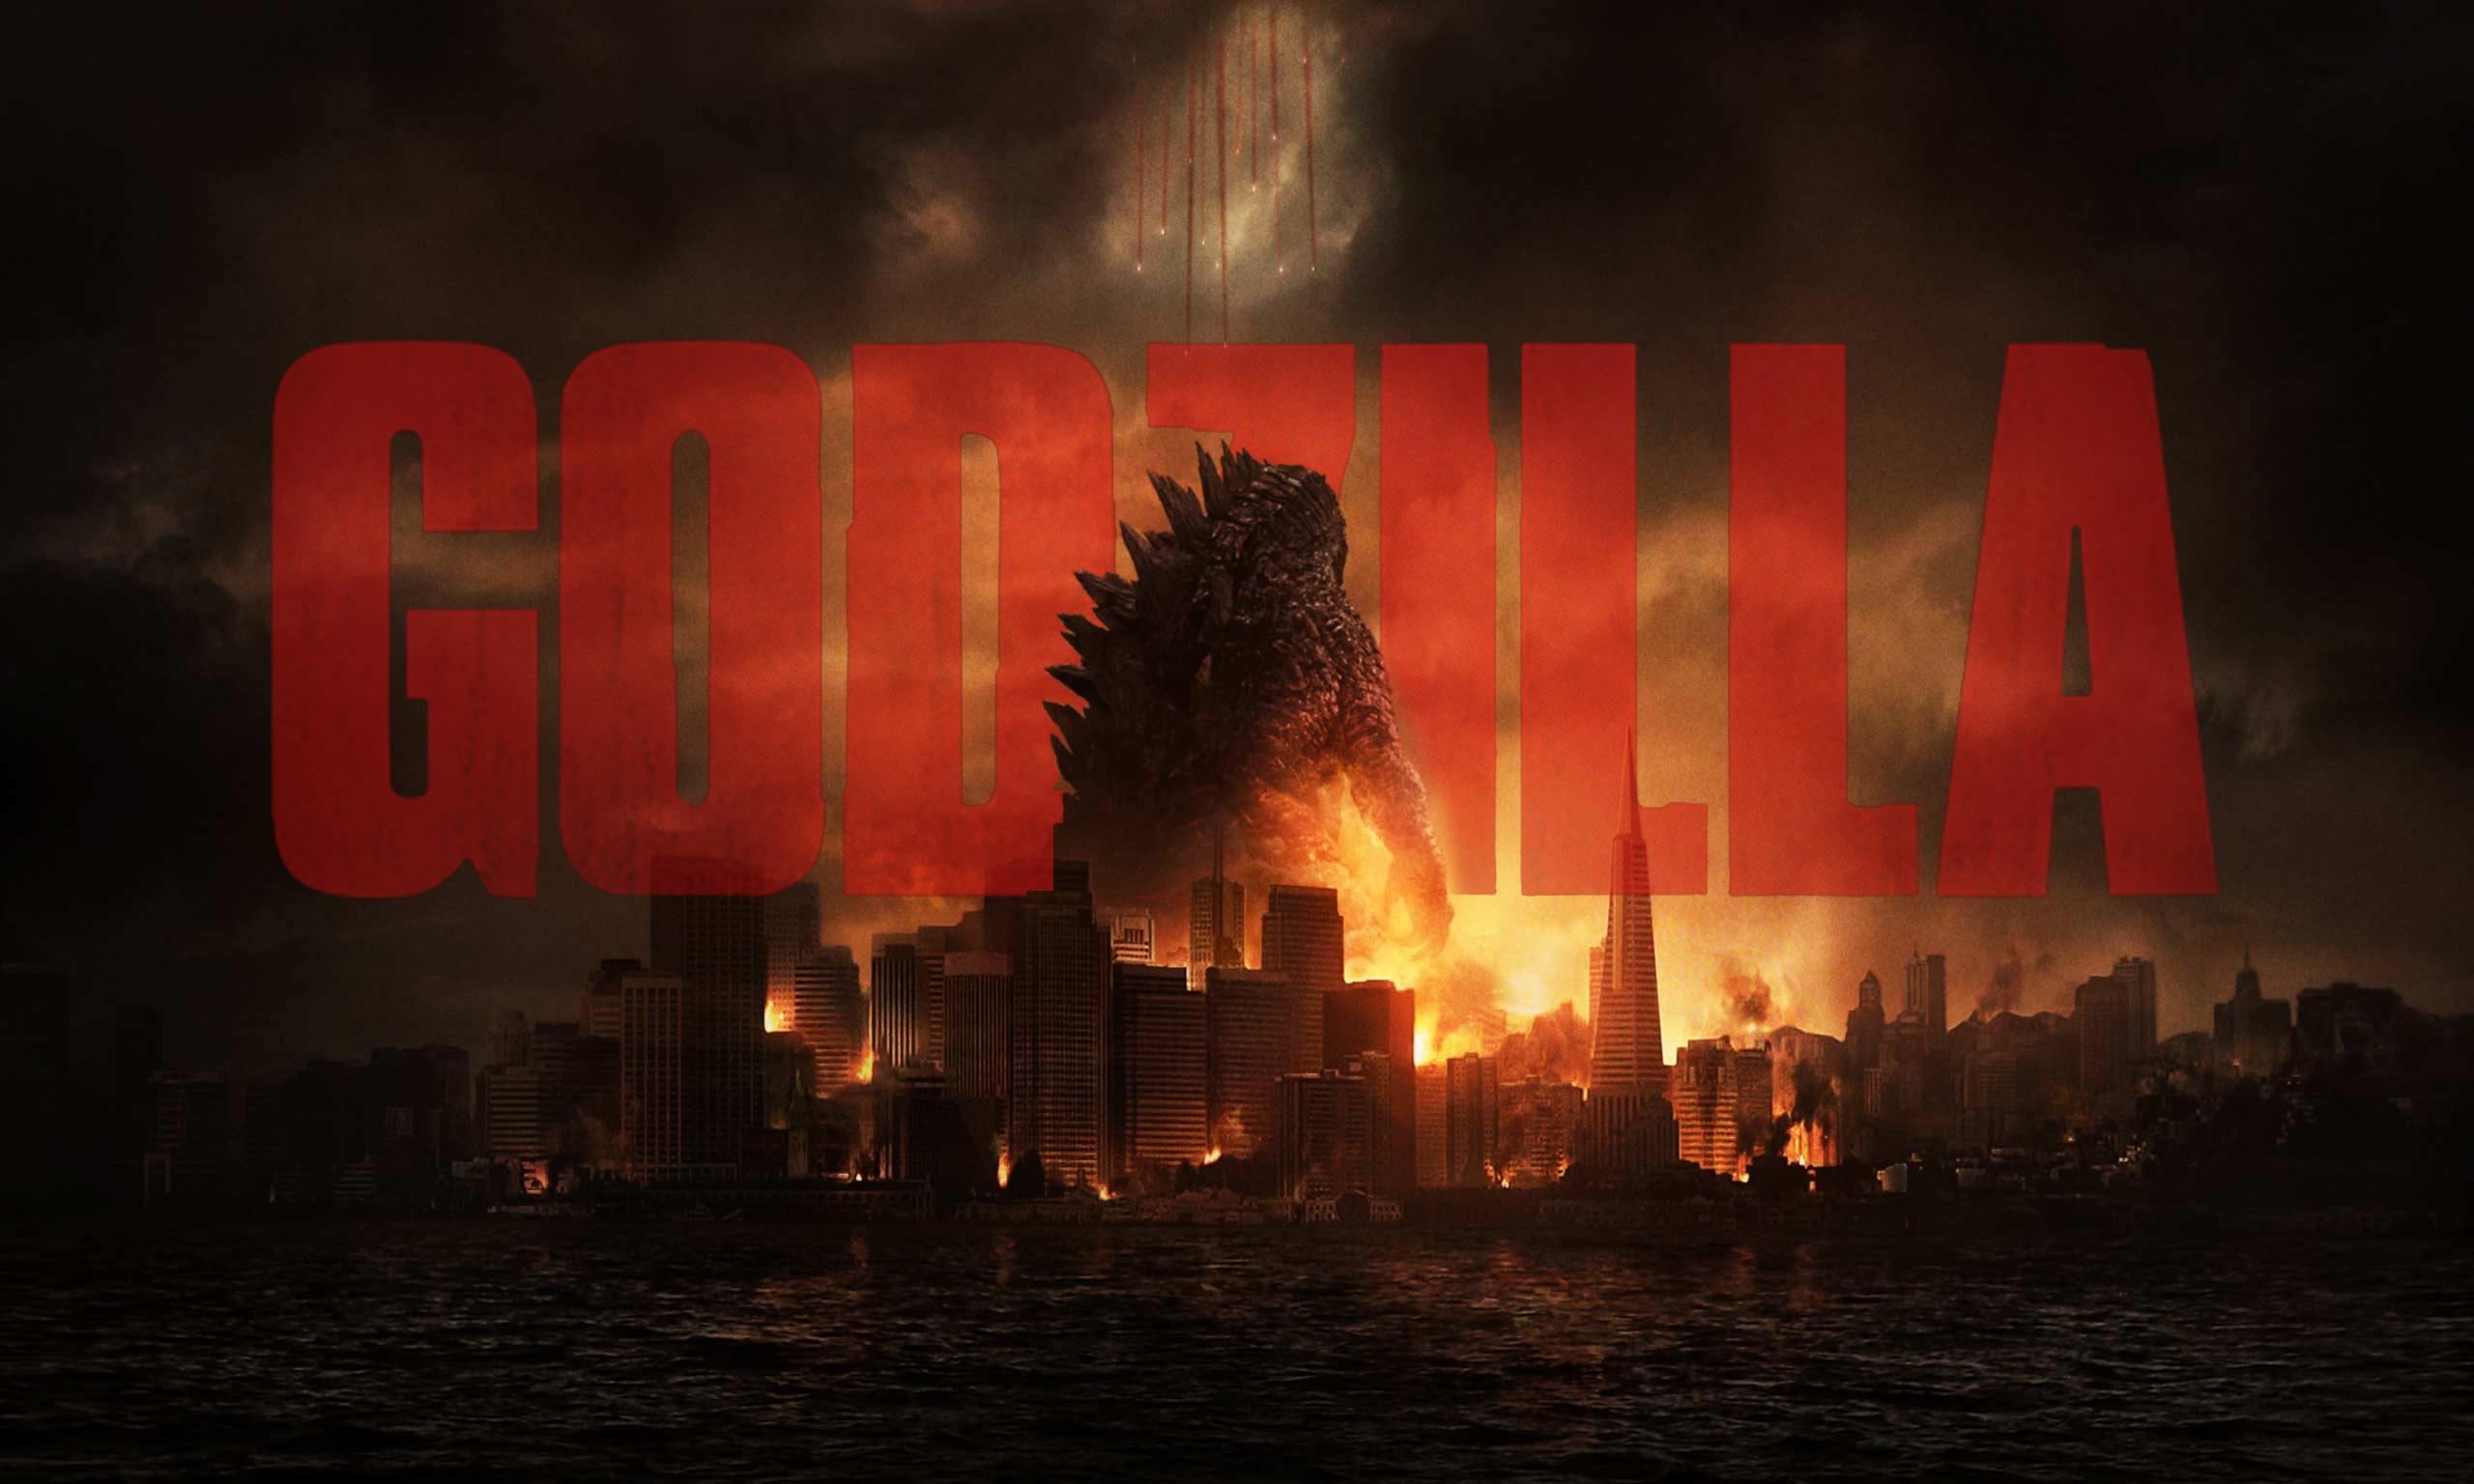 GOdzilla 2014 wallpaperjpg 2560x1536